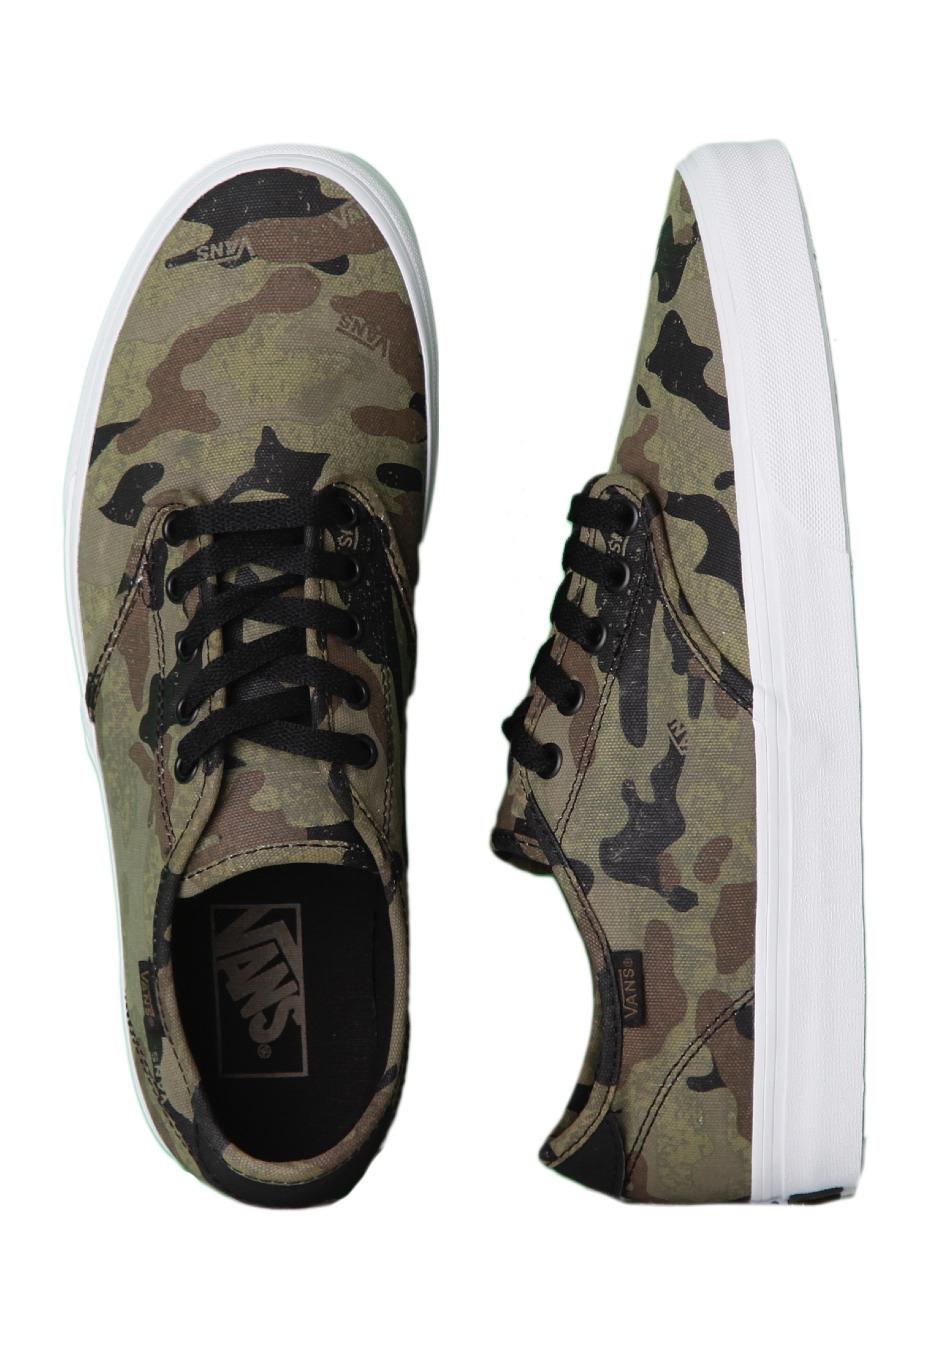 Vans - Camden Camo Army/Black - Shoes - Impericon.com ...